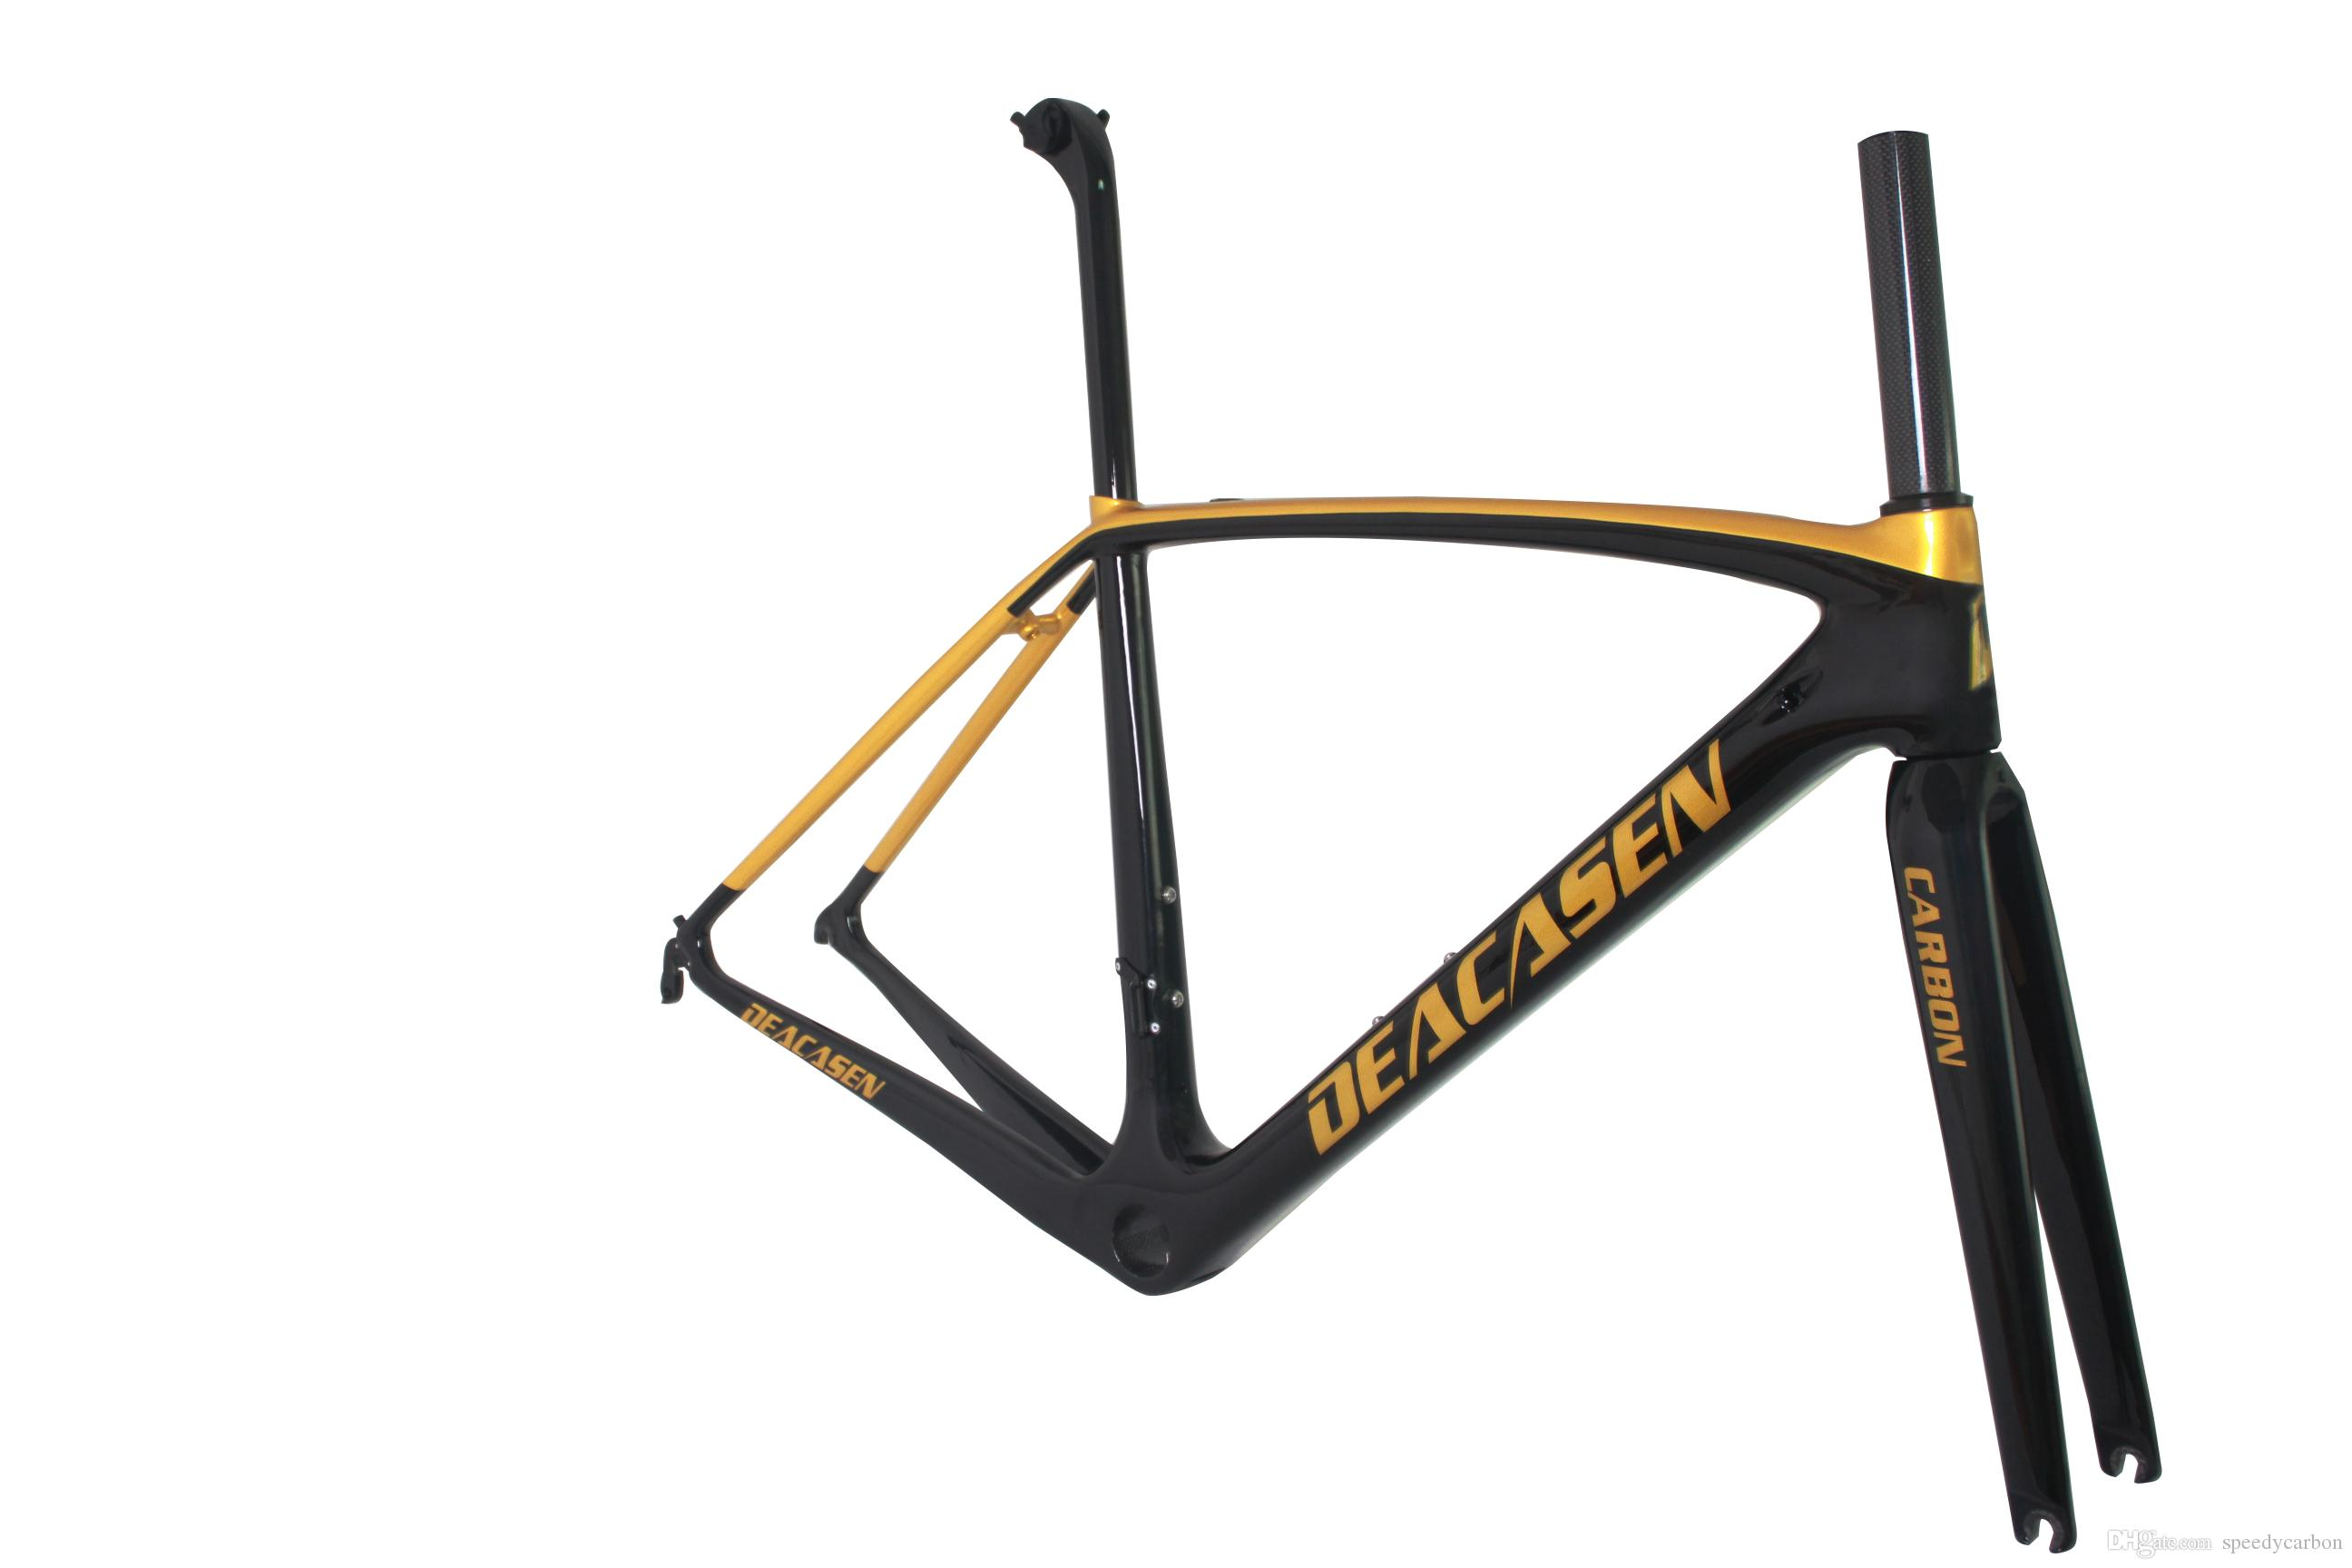 2018 Carbon Bike Frame New Design With Fork Bike Frame Light Frame+ ...